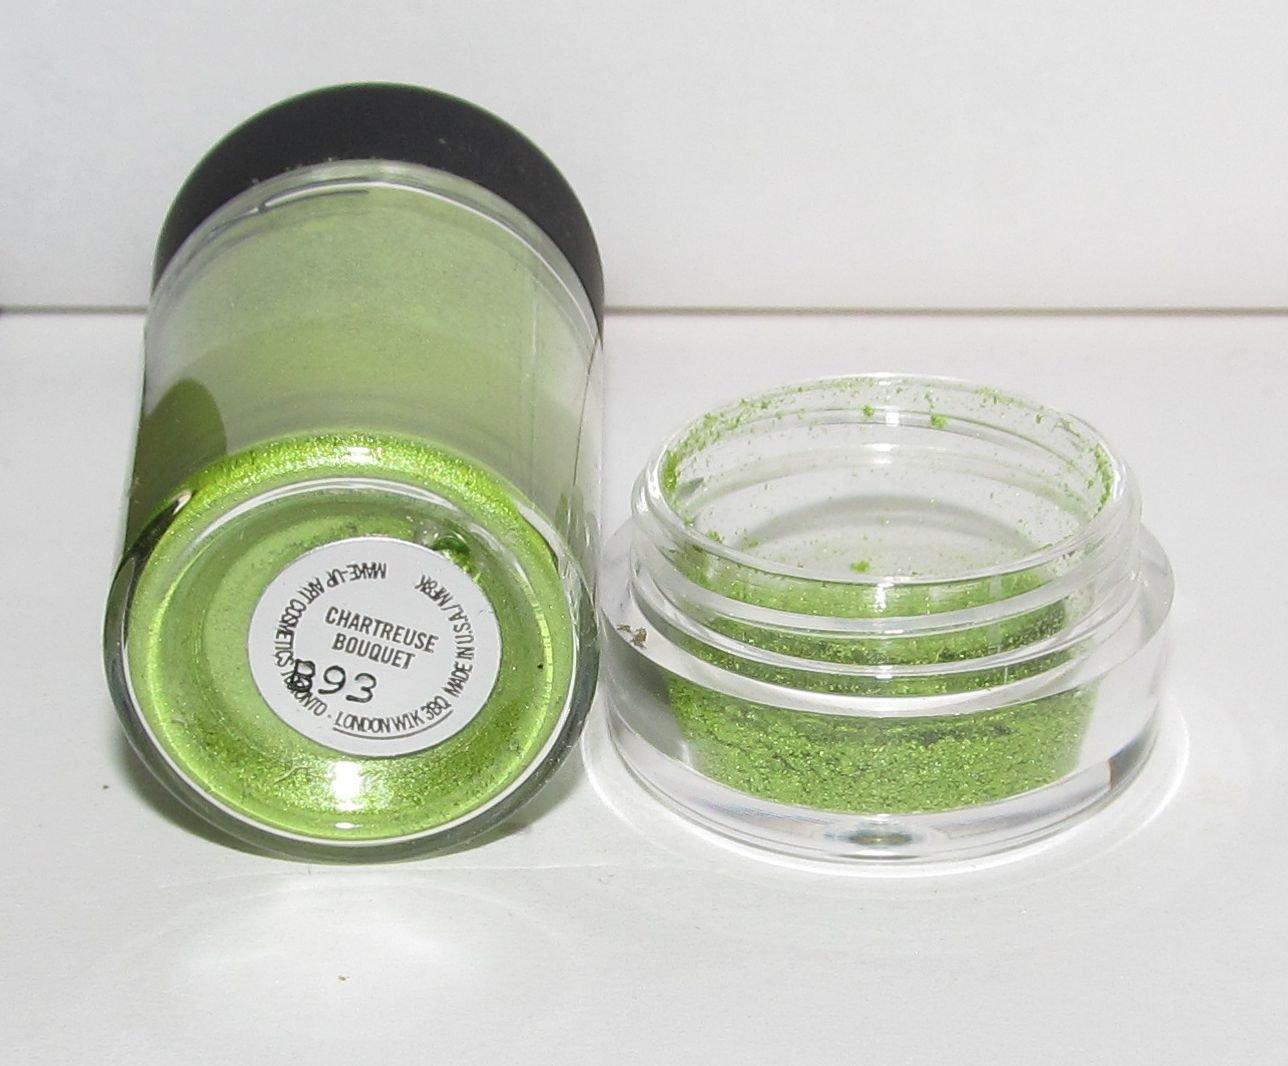 MAC Pigment Sample - Chartreuse Bouquet 1/4 tsp Sample